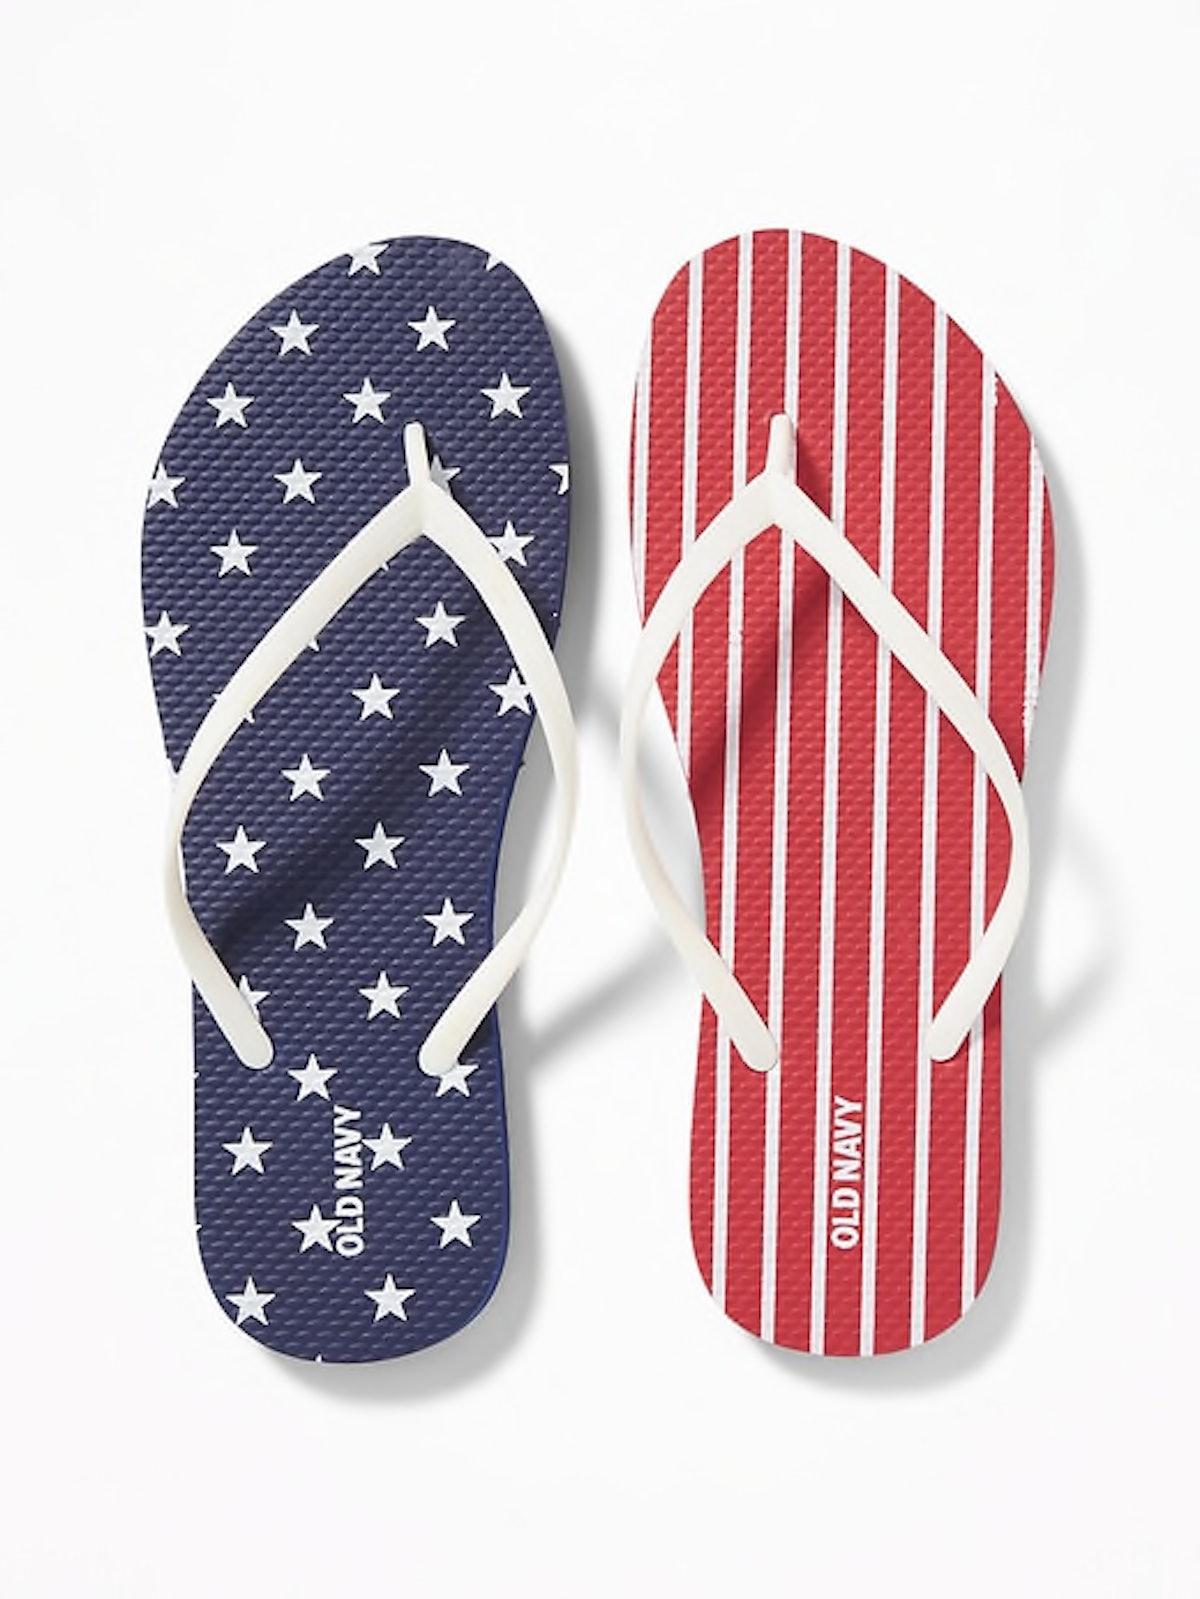 All American Patterned Flip-Flops